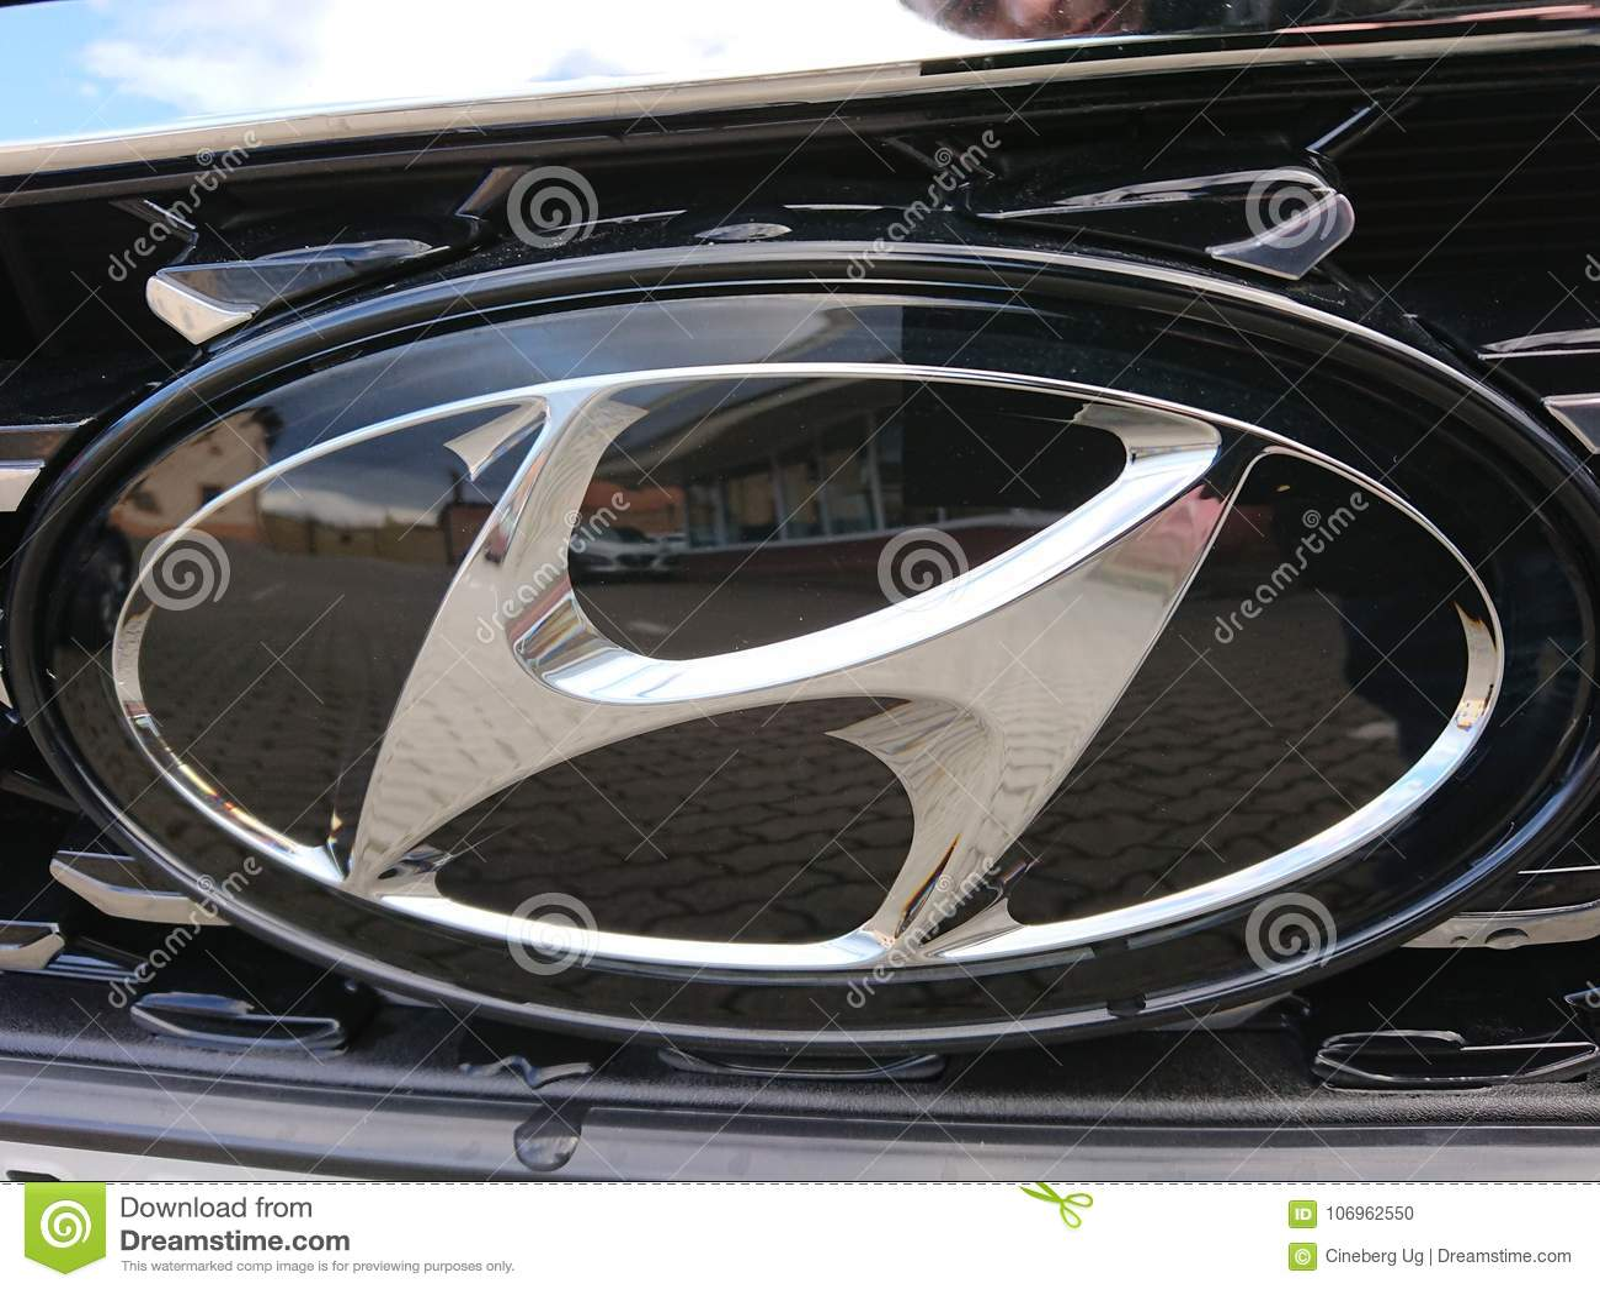 Hyundai bilsymbol